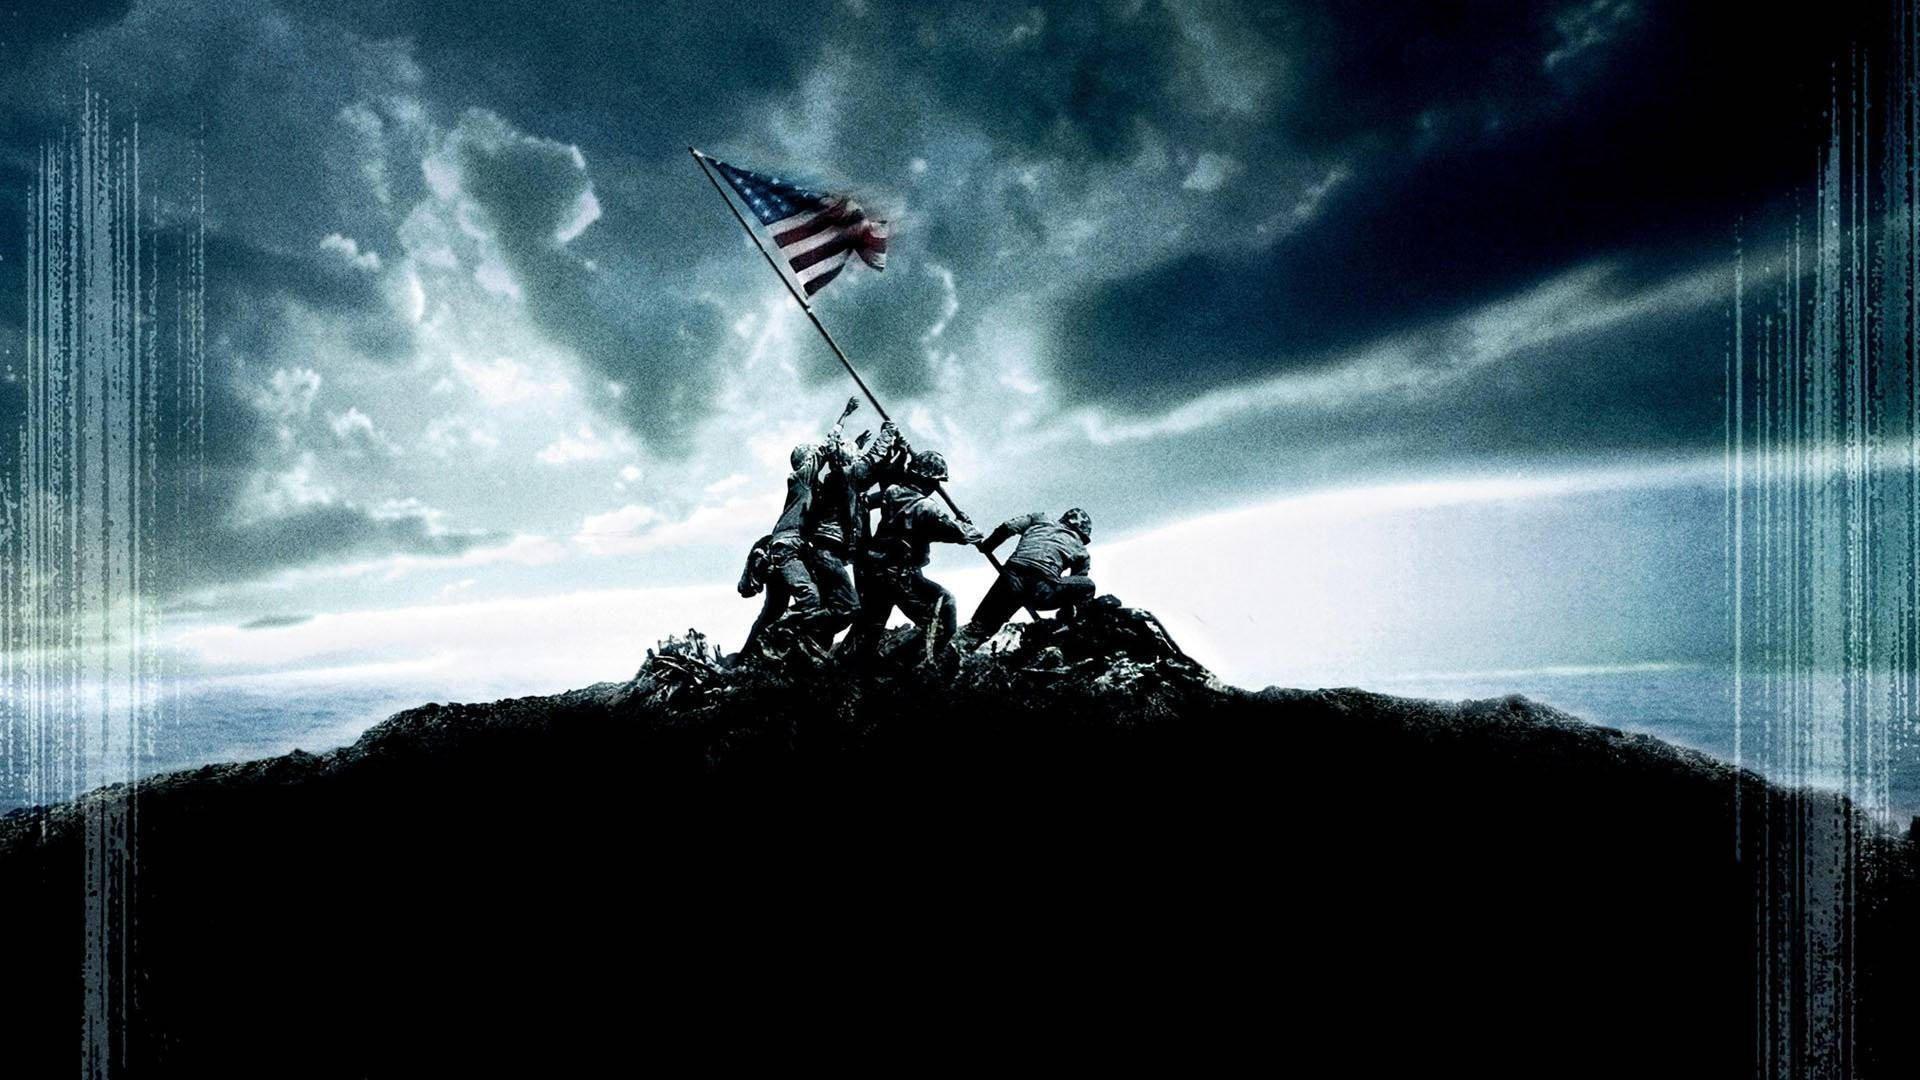 usmc-desktop wallpaper taken from US Marine Corps Wallpaper : usmc .